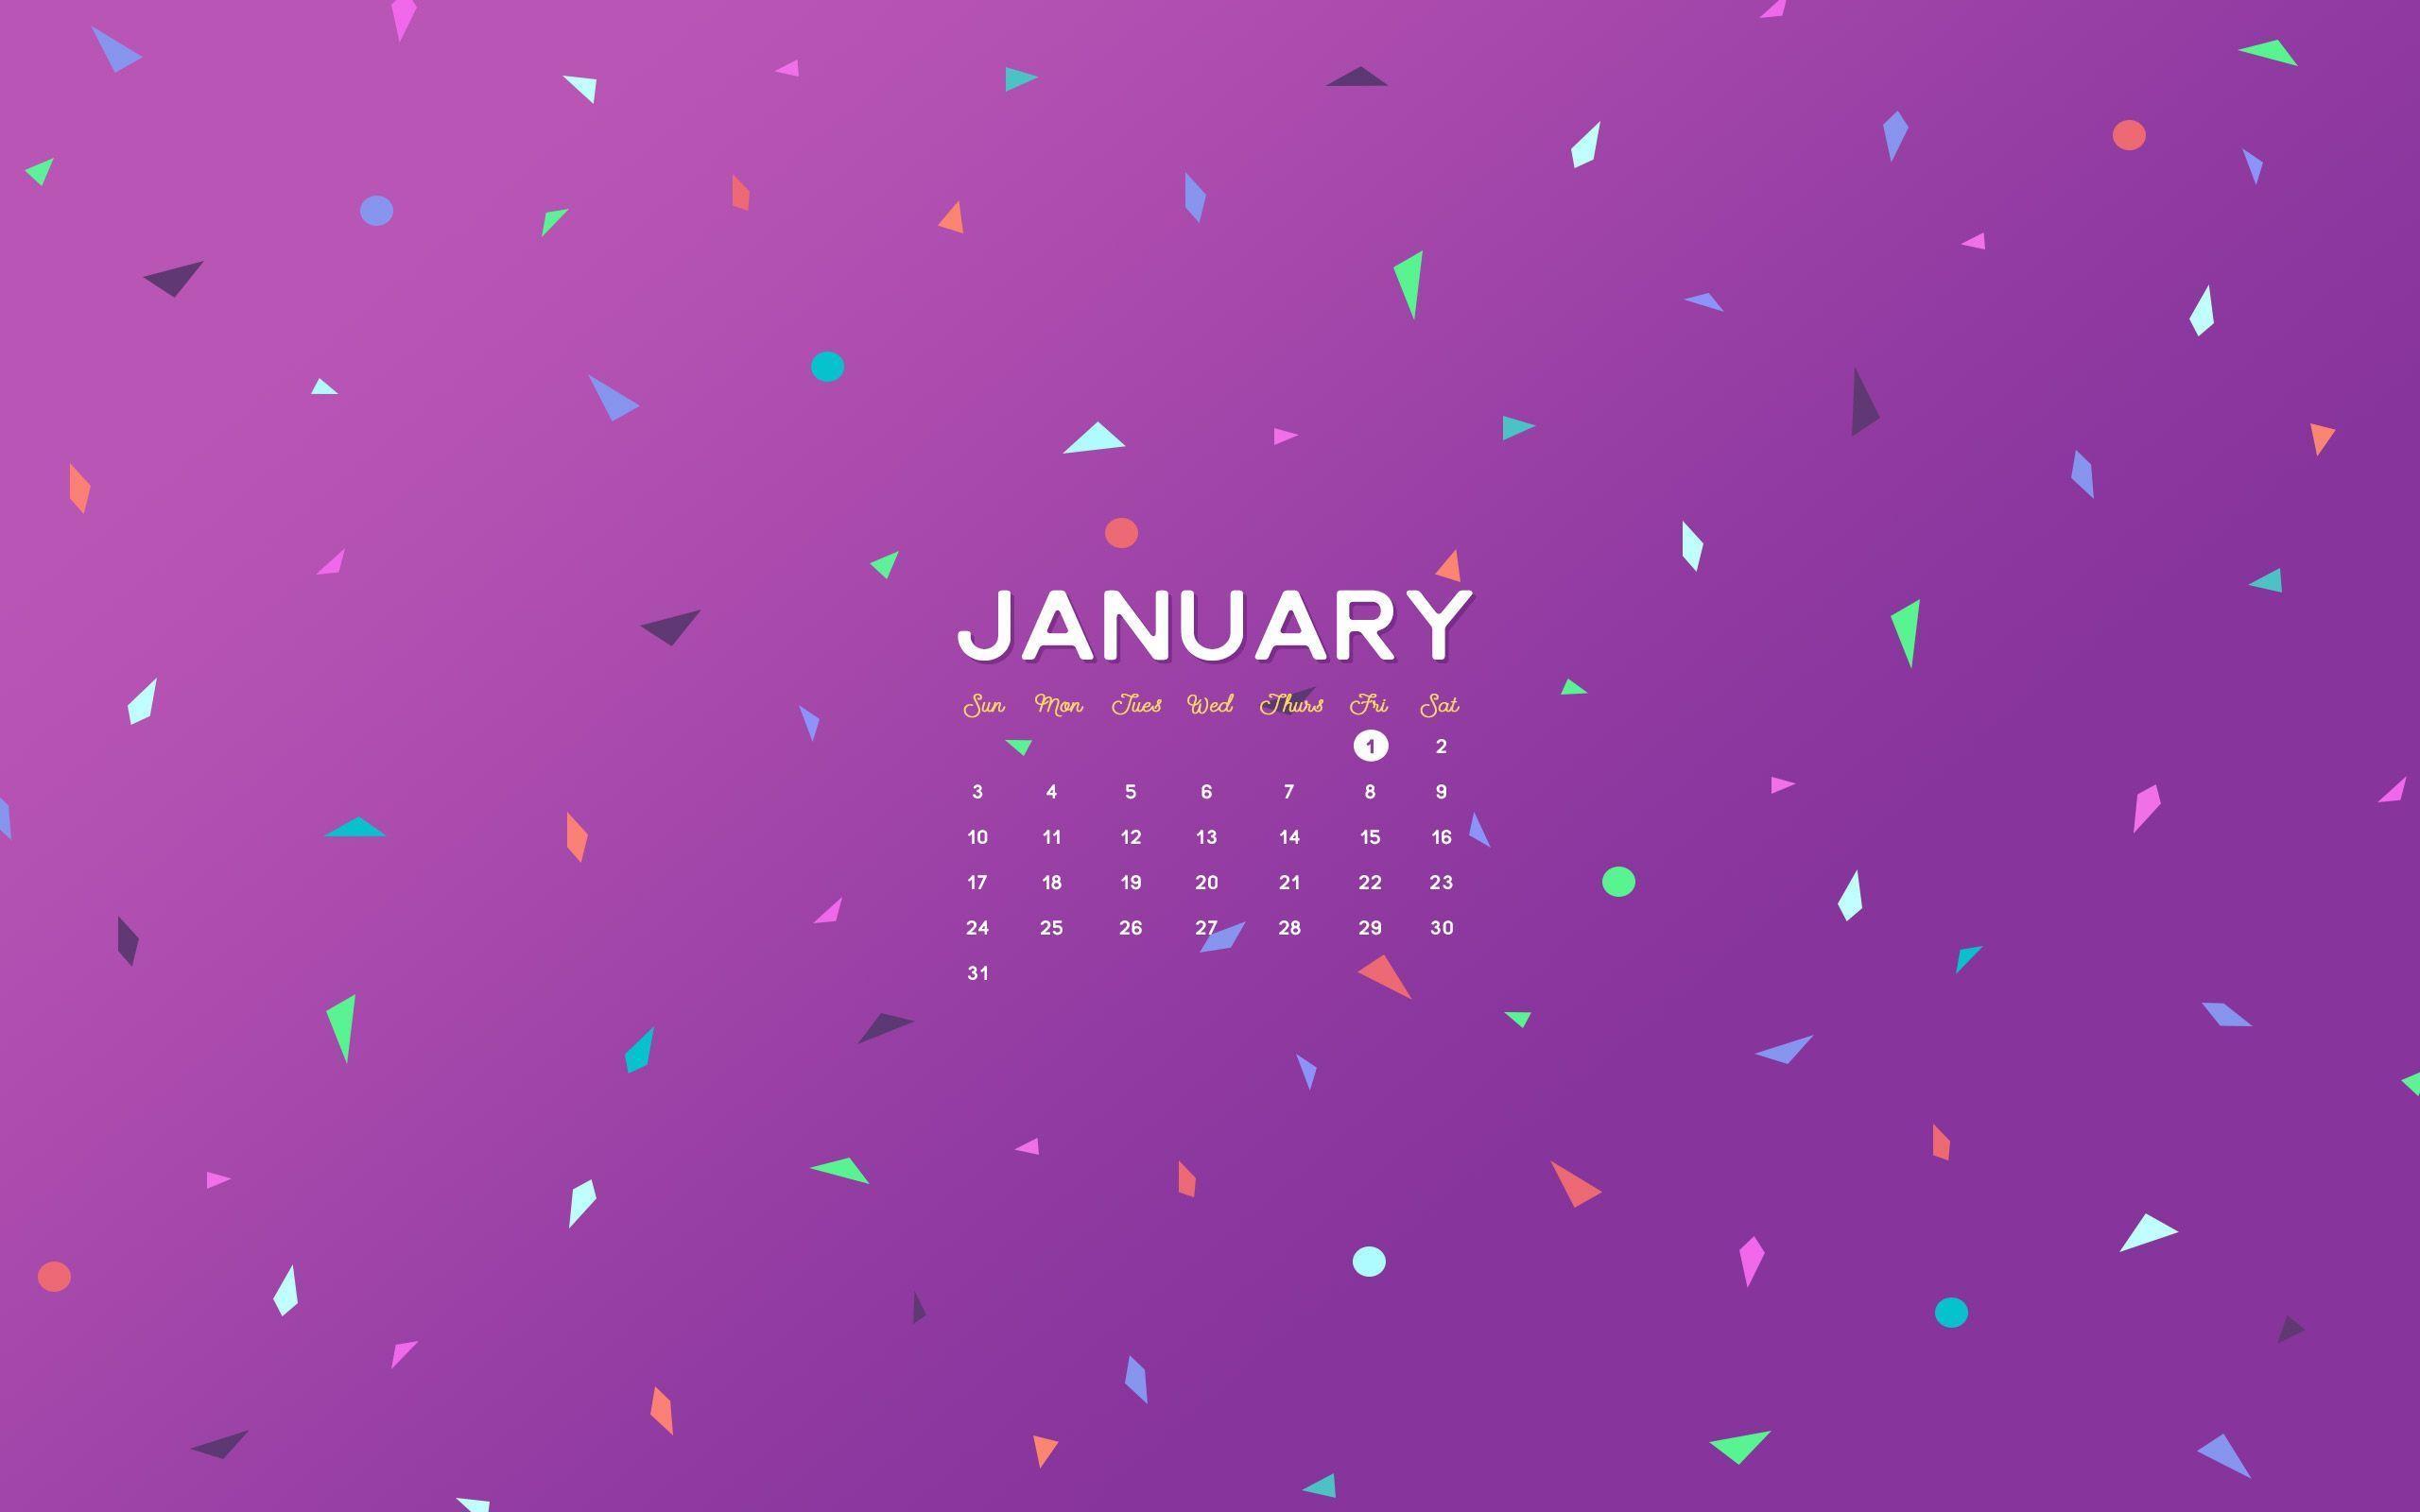 Free Calendar Wallpaper January : Free wallpapers of wallpaper cave